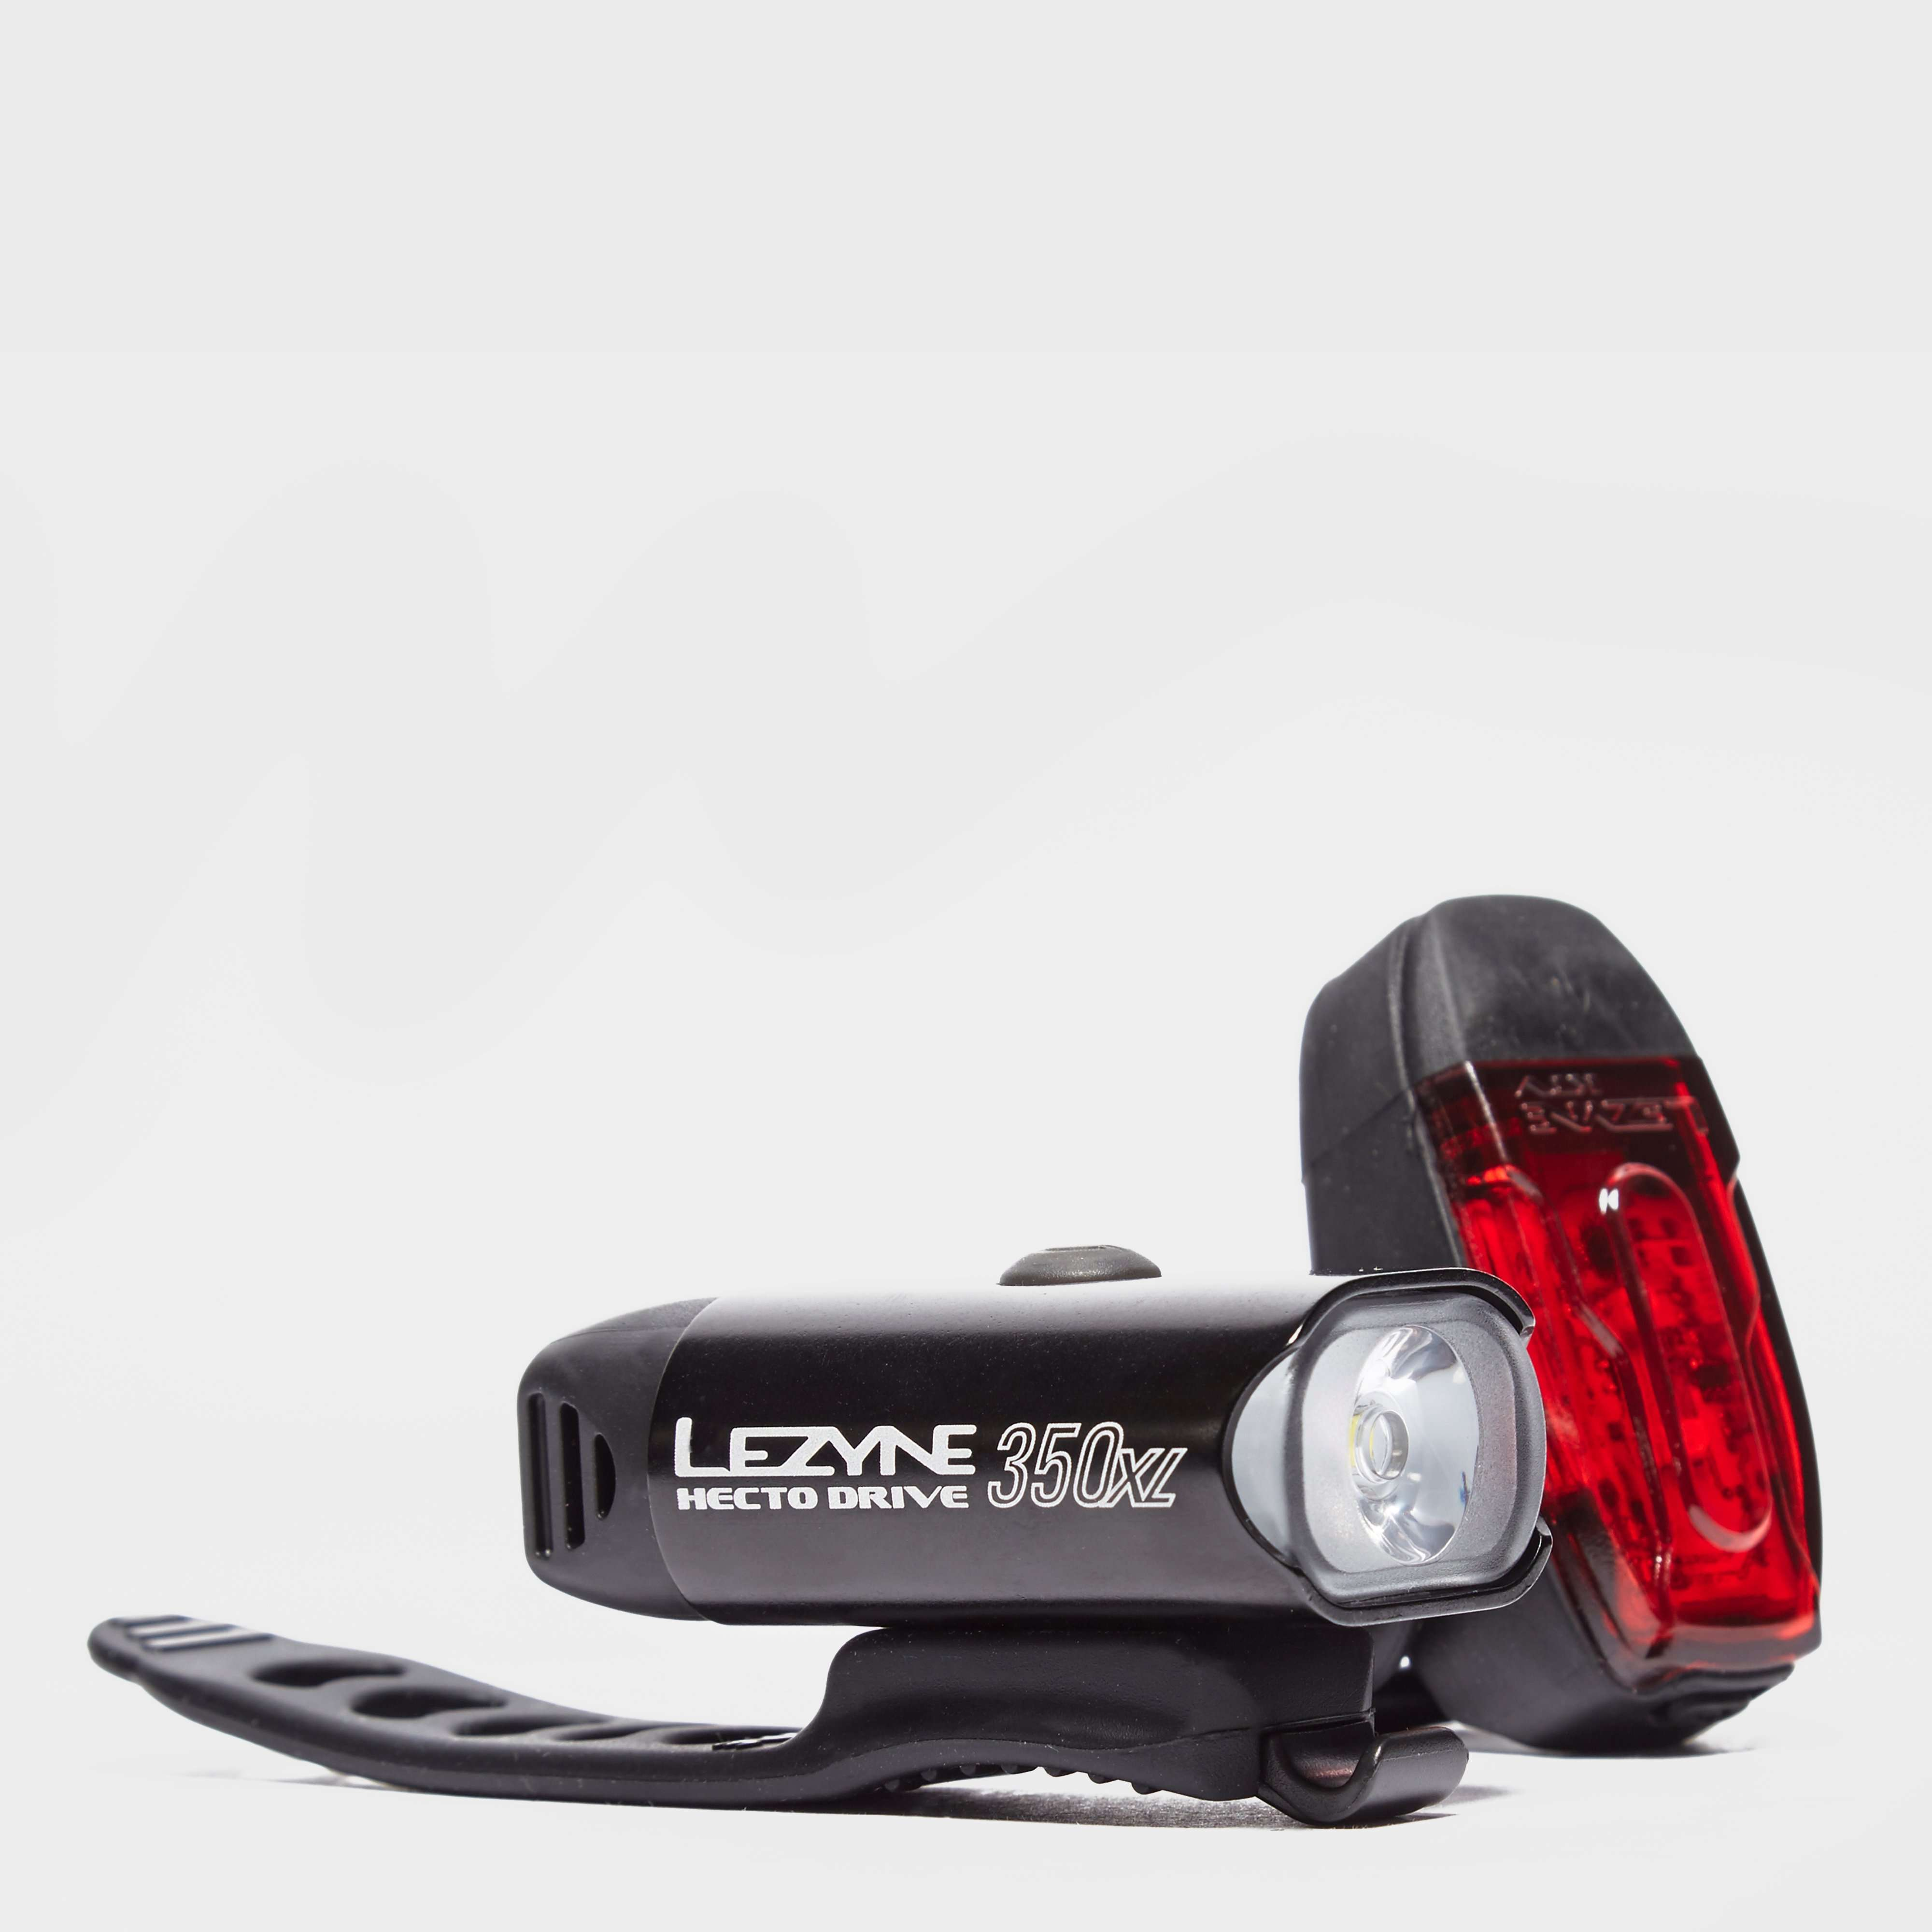 LEZYNE Hecto Drive 350 XL and KTV Rear Bike Light